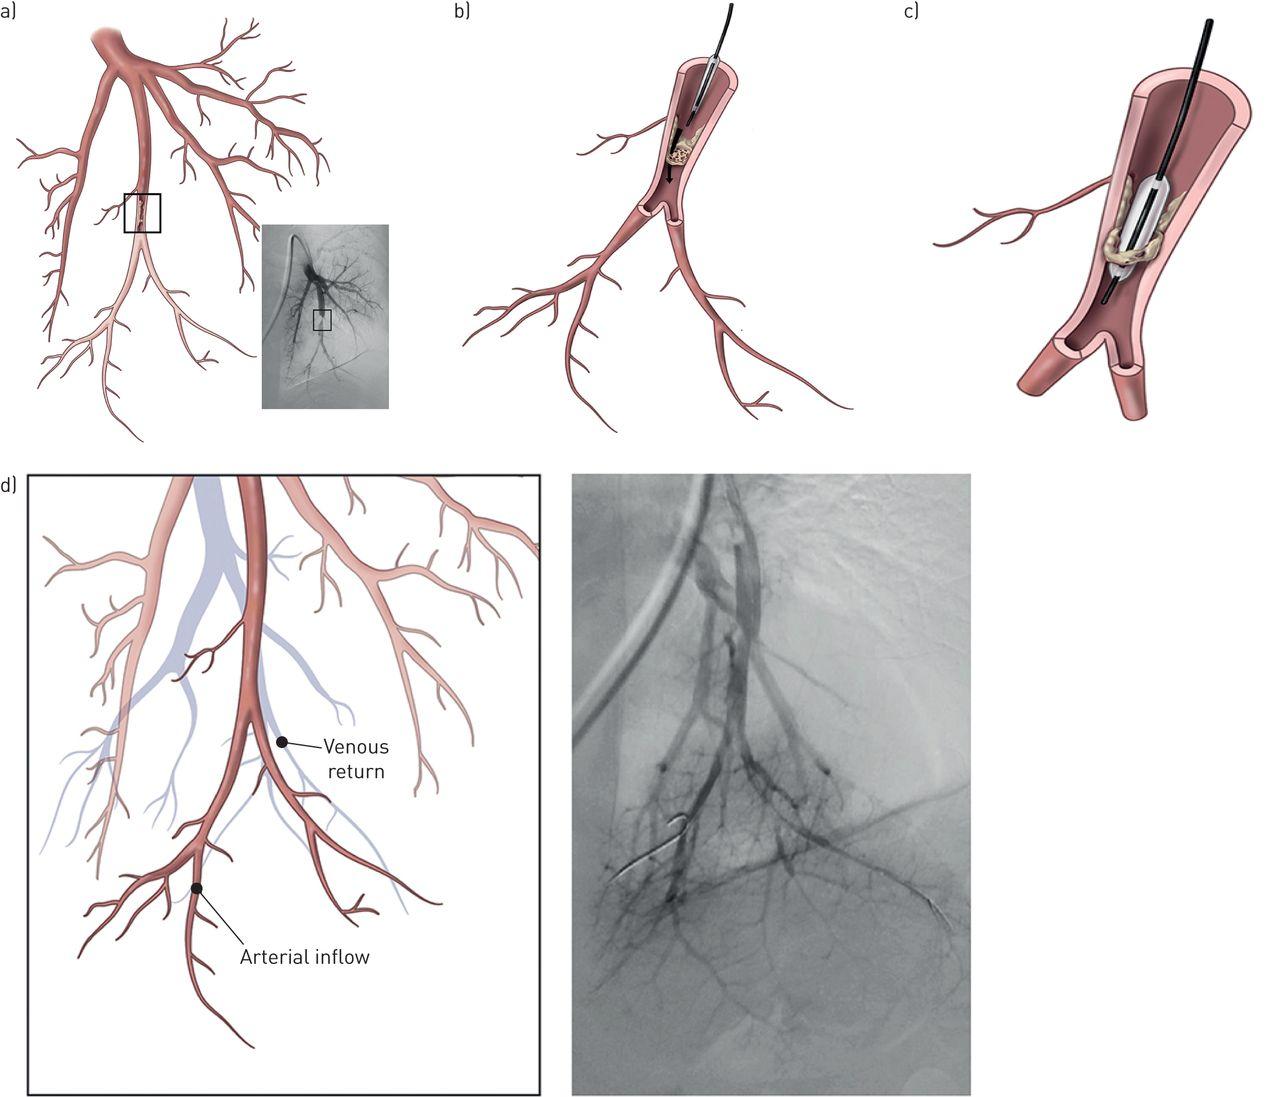 balloon pulmonary angioplasty in chronic thromboembolic pulmonary